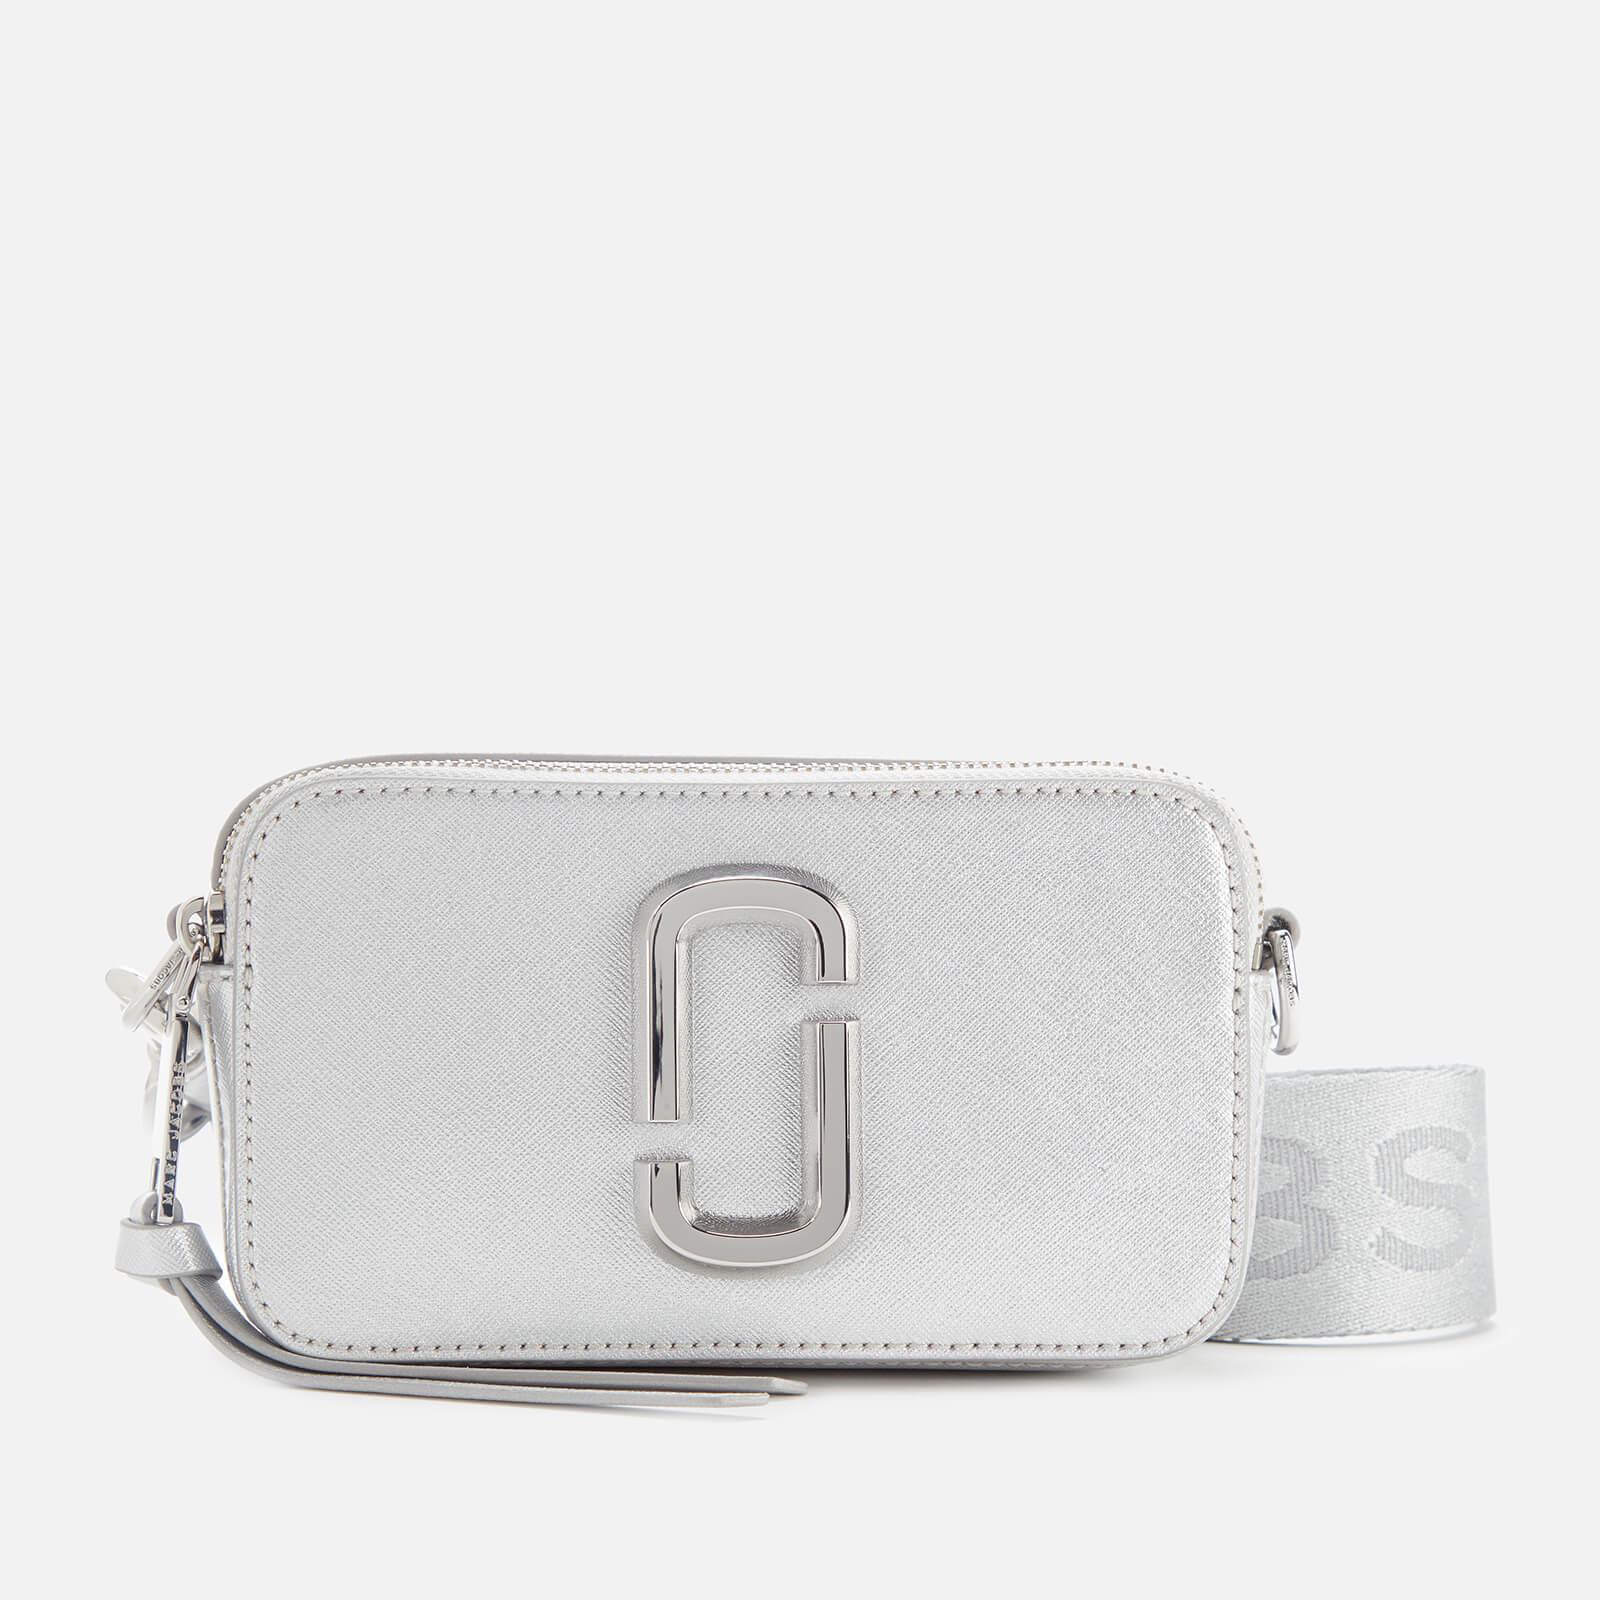 Marc Jacobs Women's Snapshot DTM Cross Body Bag - Metallic Silver